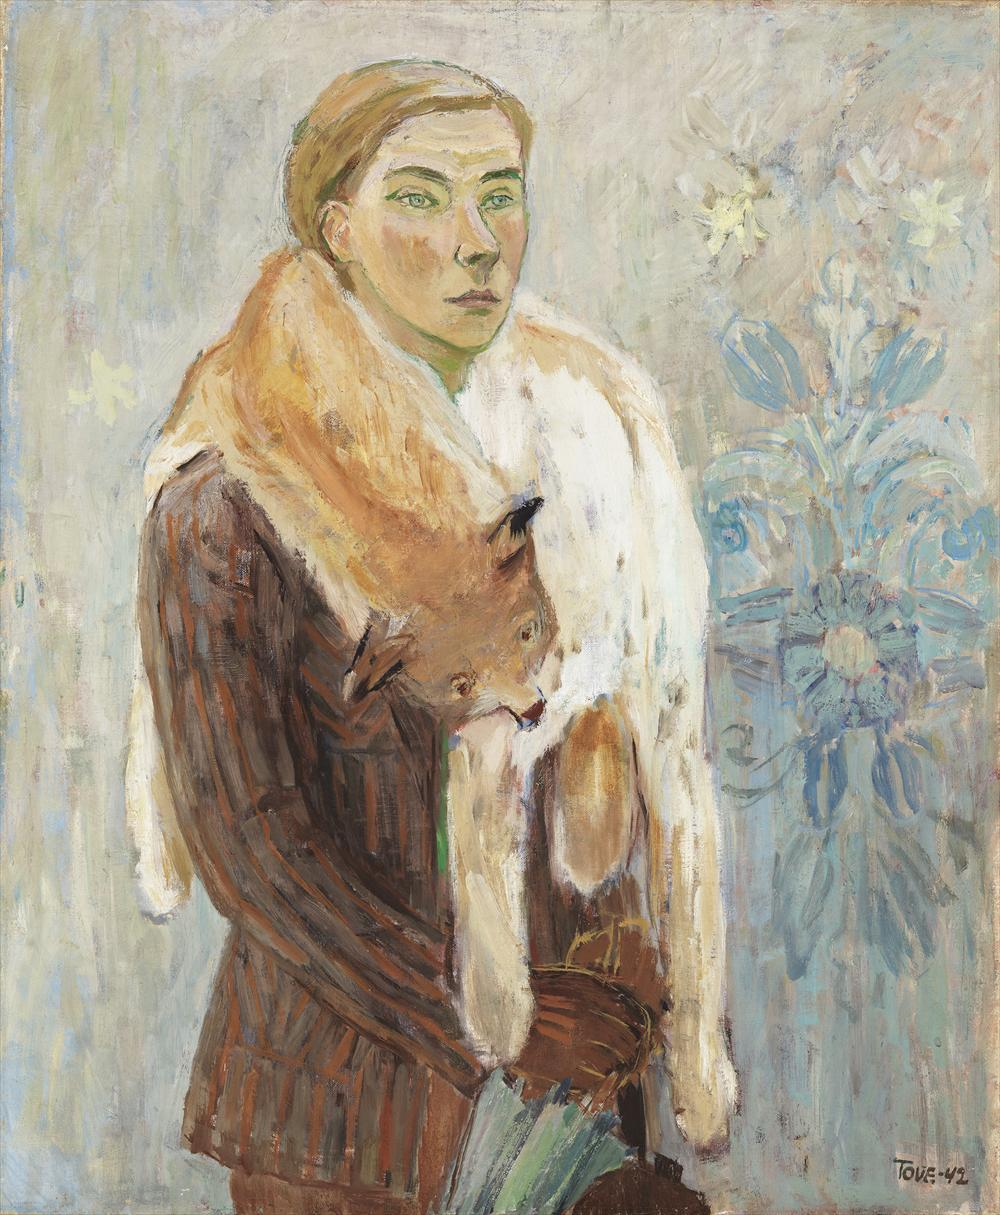 Туве Янссон: обложки и живопись